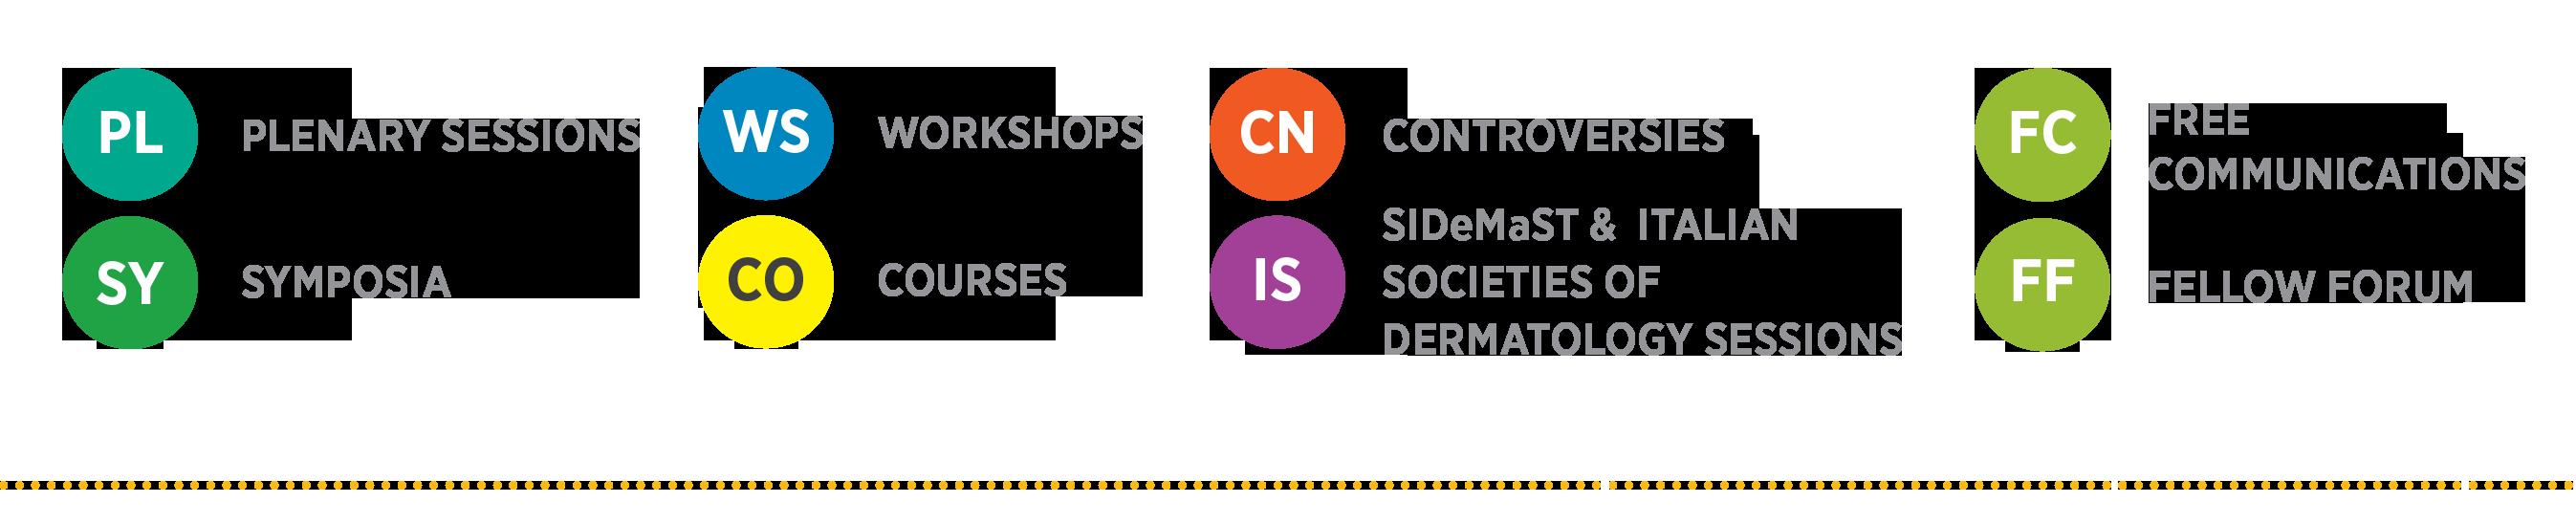 Scientific Programme - 24th World Congress of Dermatology